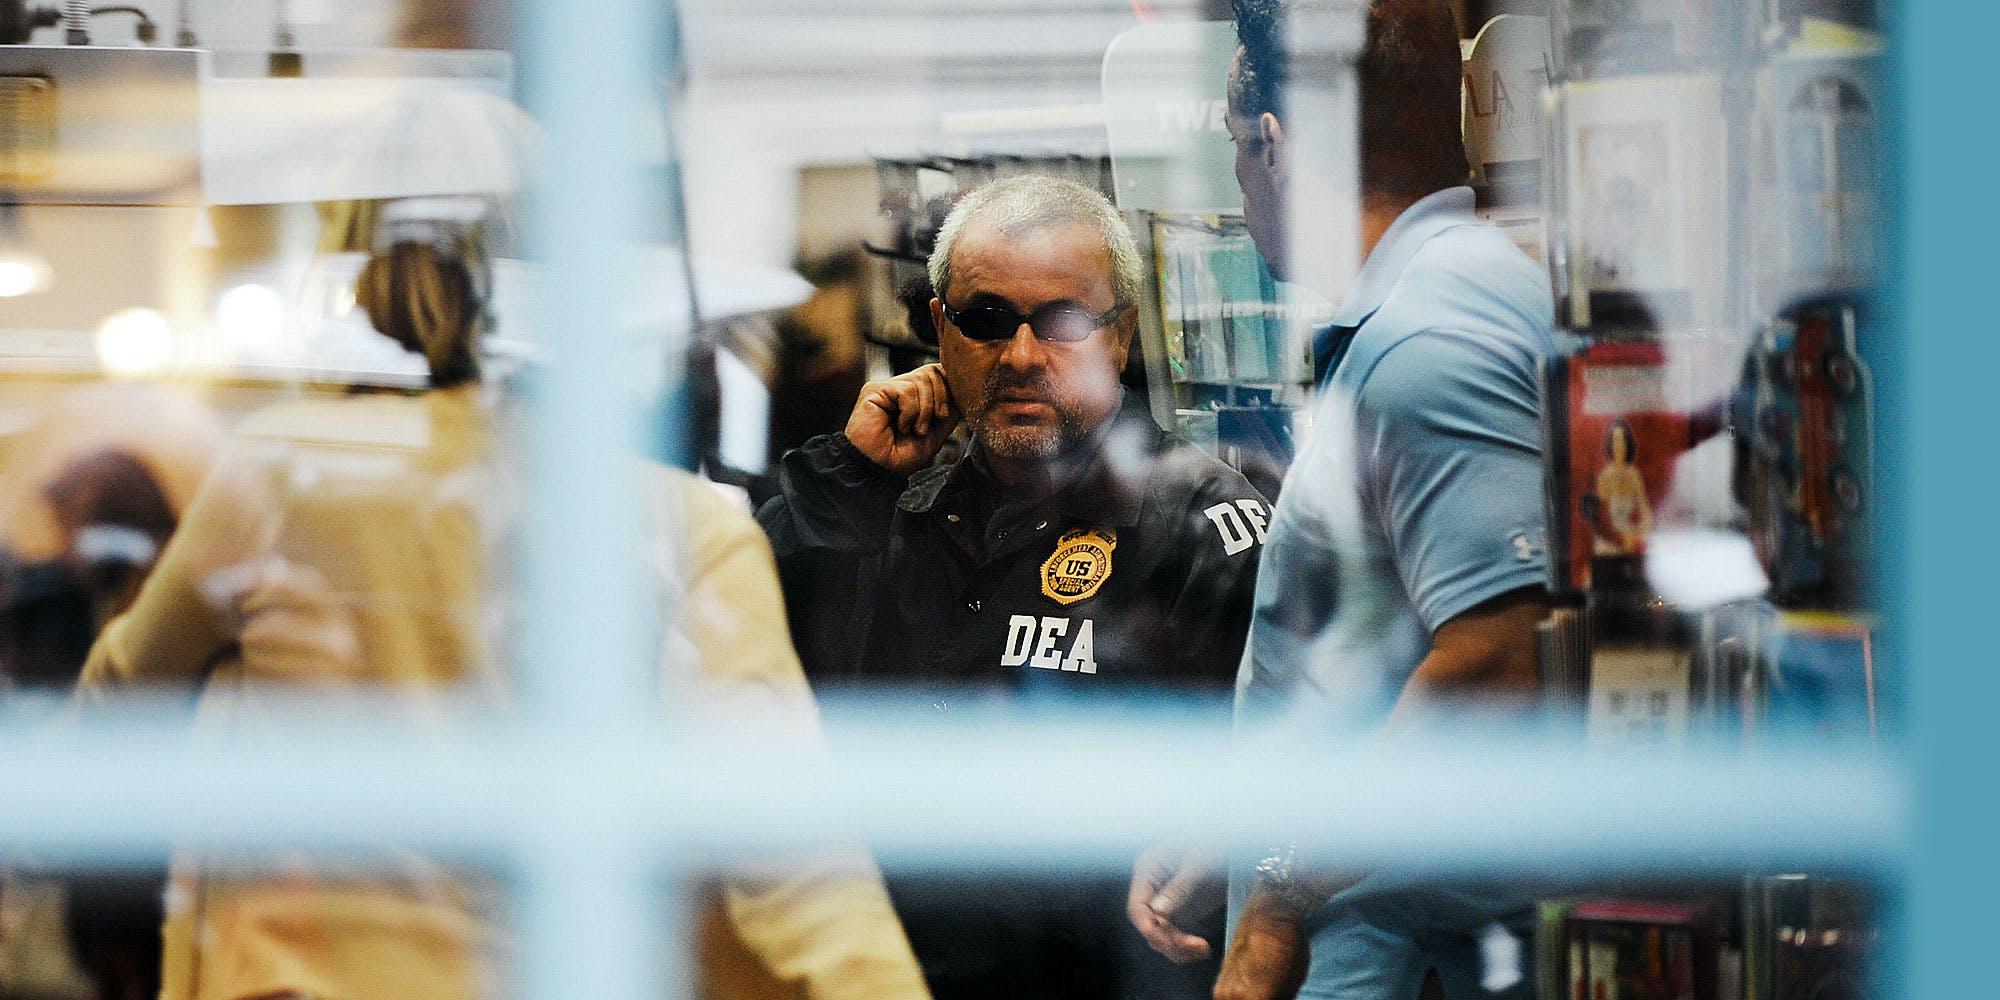 DEA agent speaking on phone